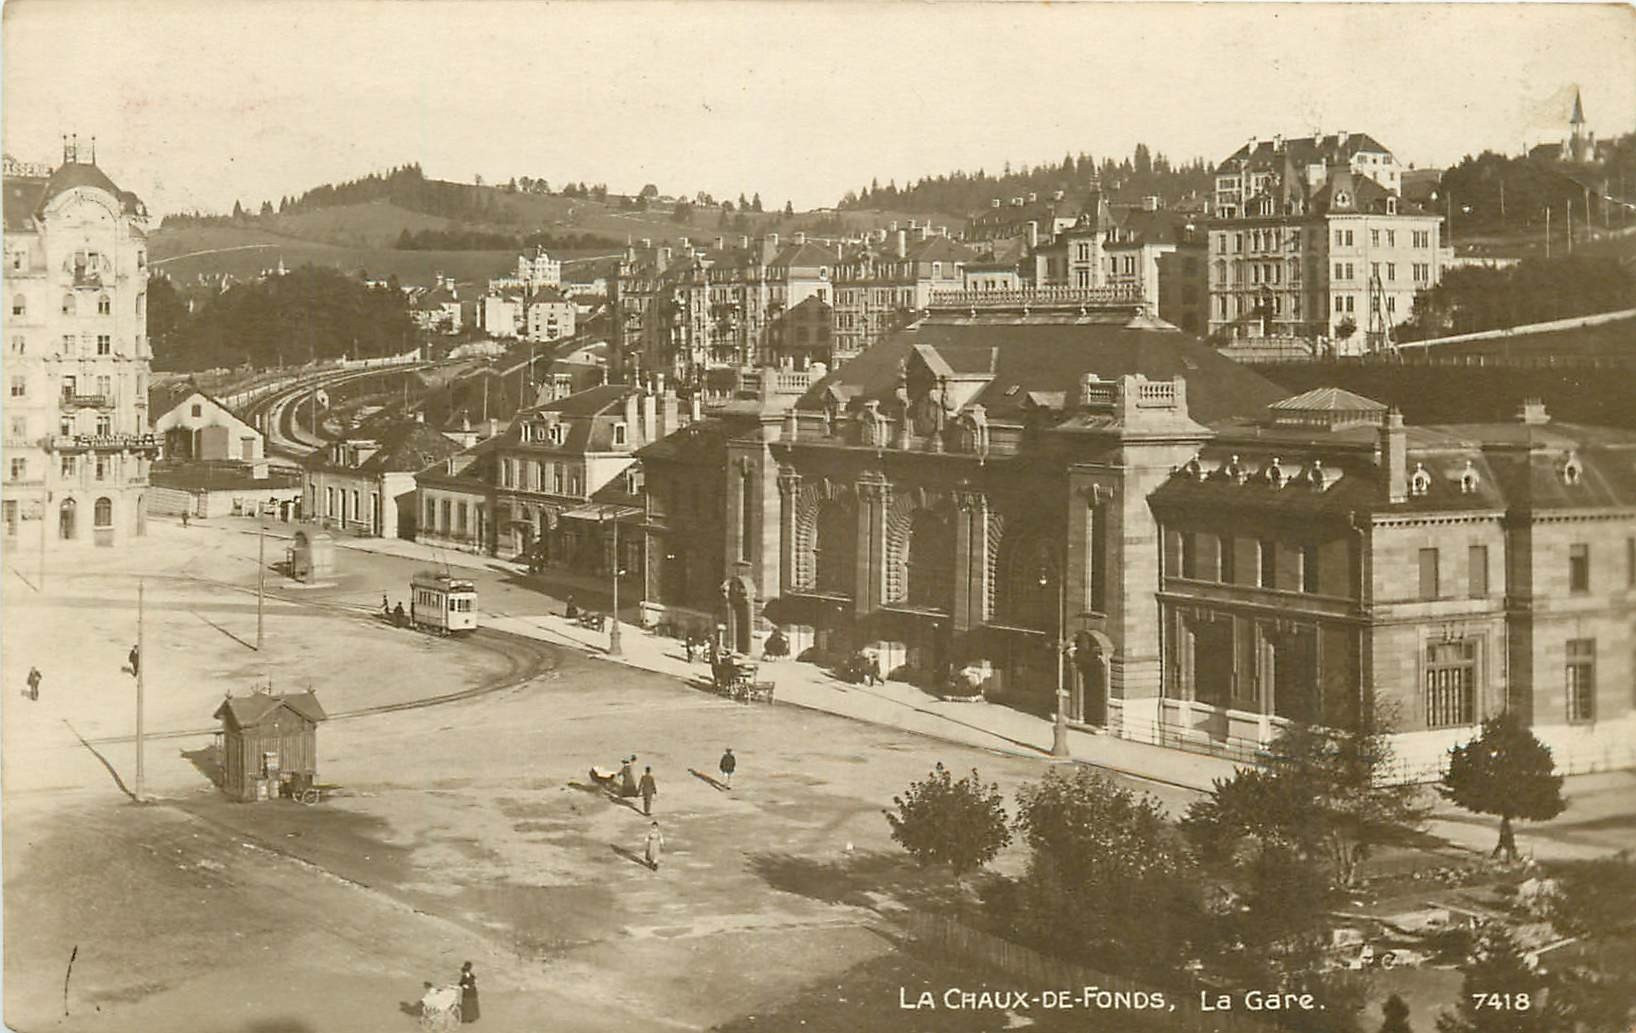 WW LA CHAUX-DE-FONDS. La Gare vers 1918